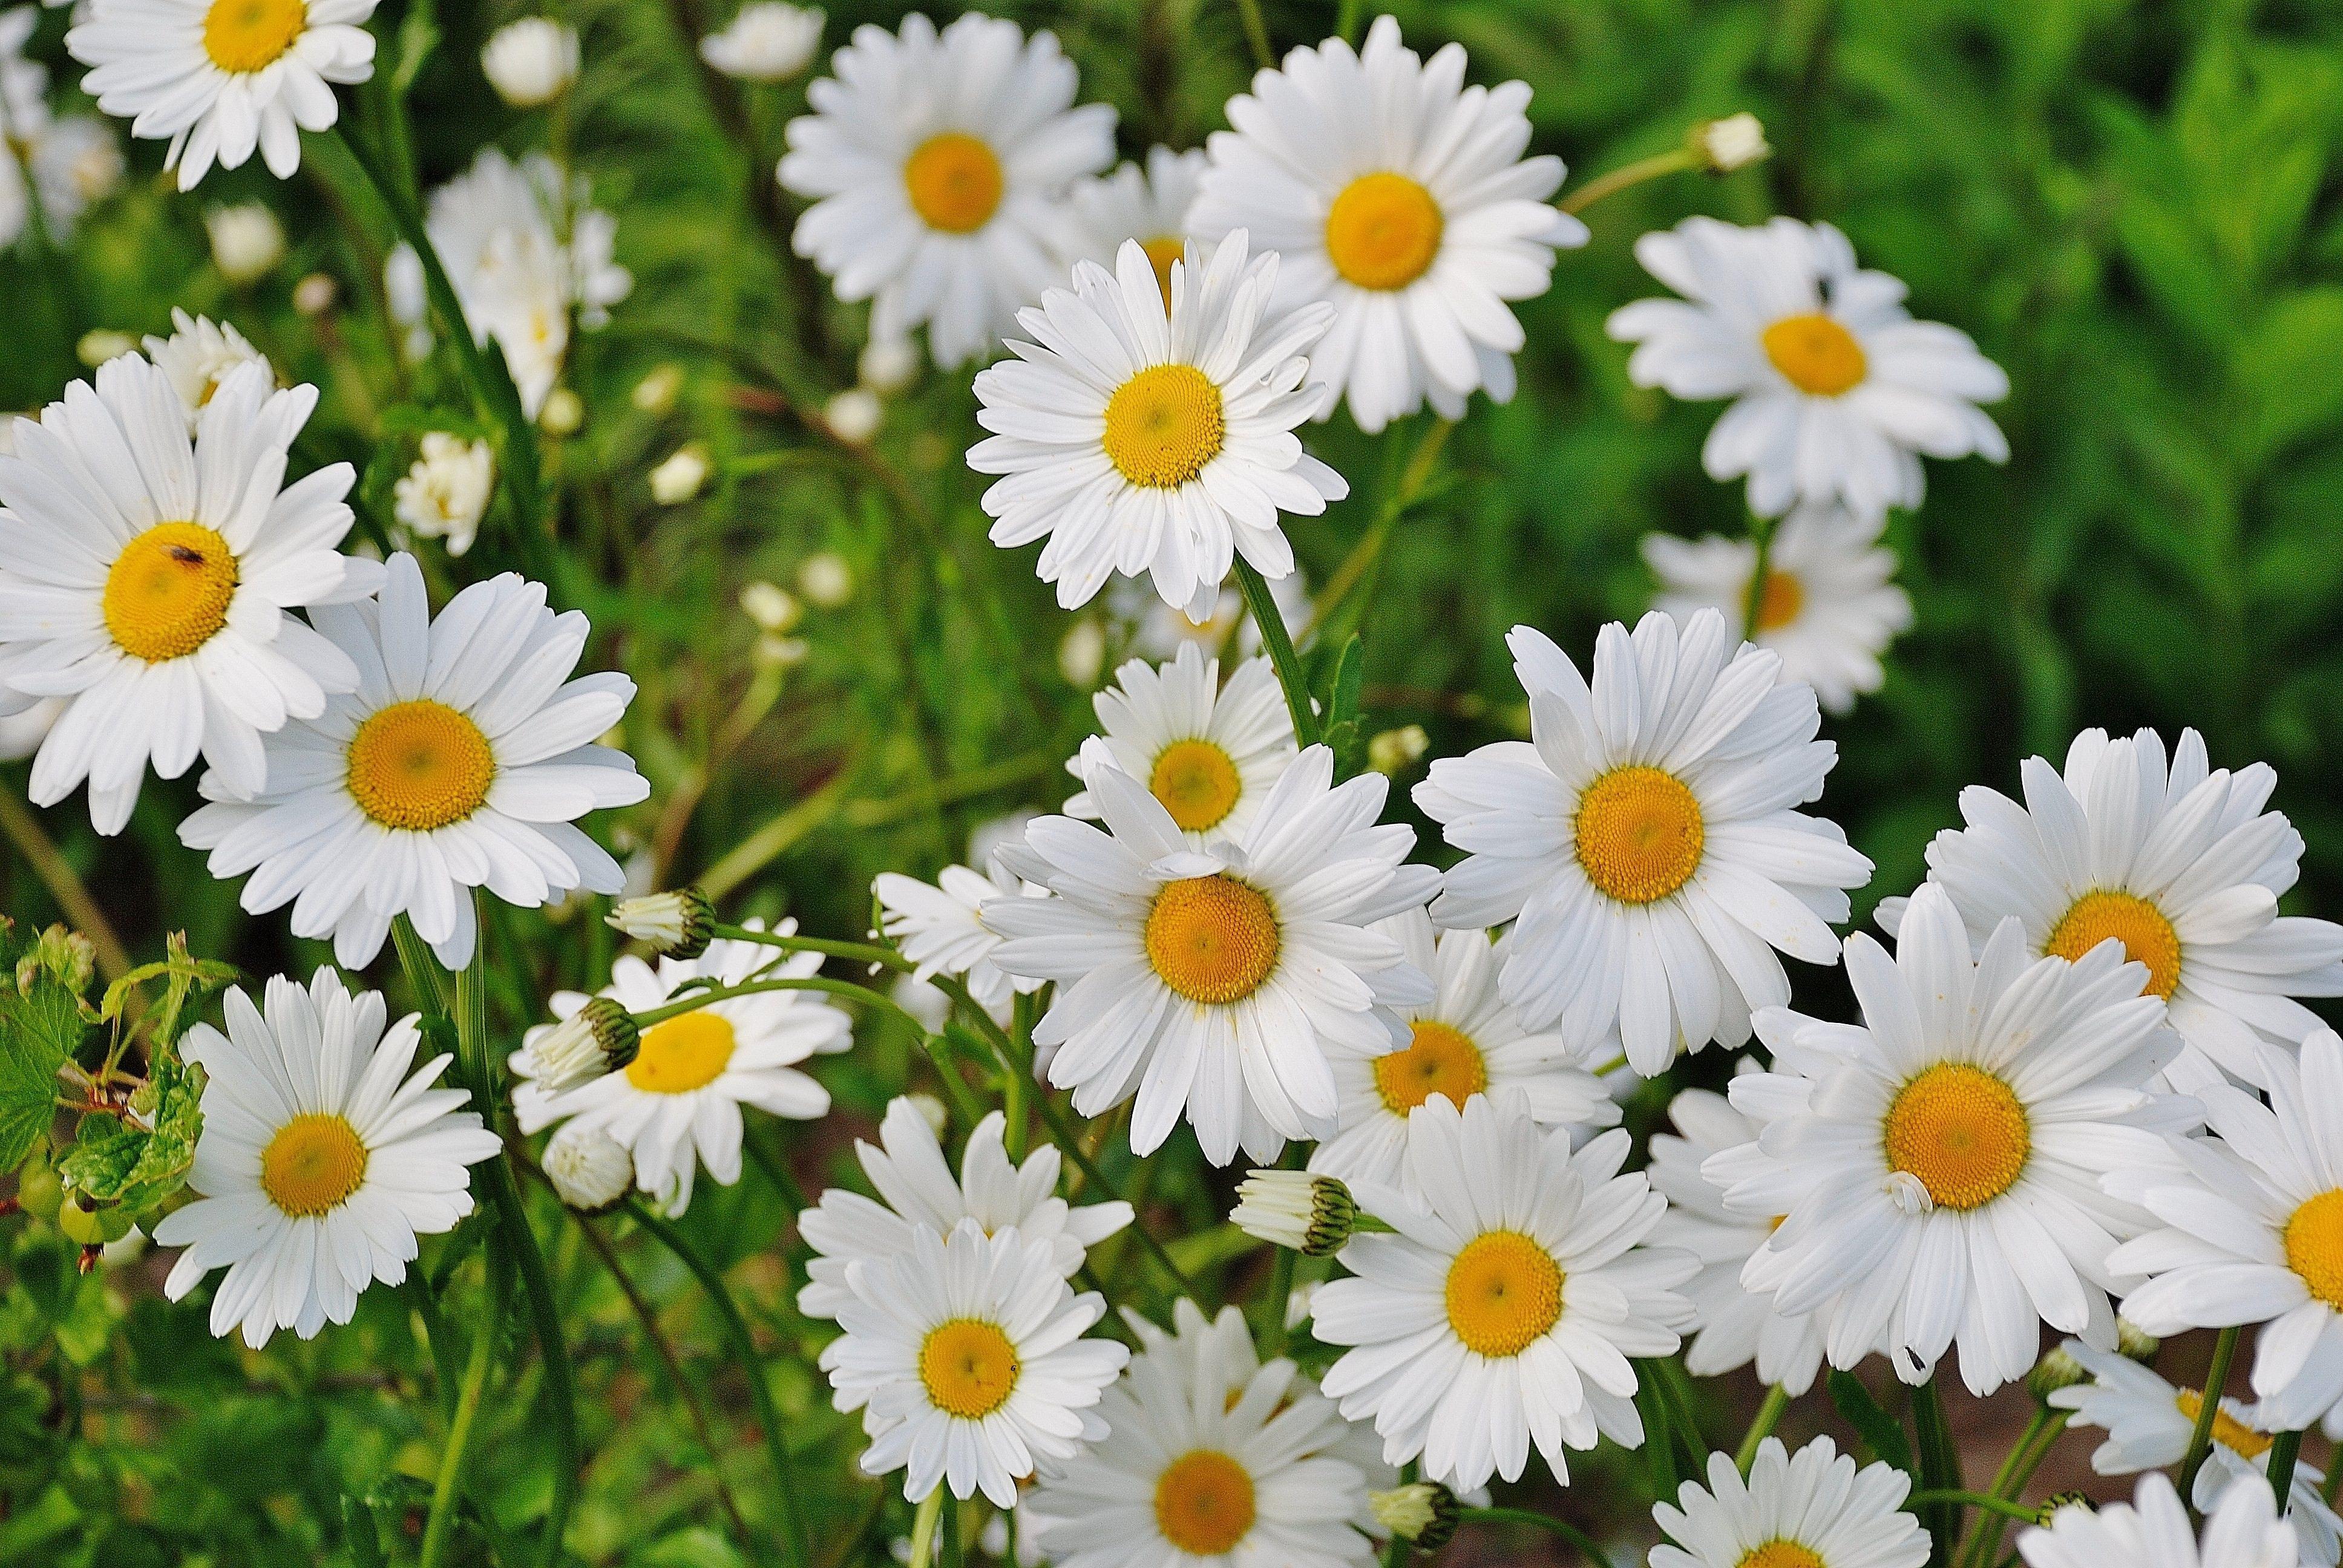 White Daisy Flower, Bloom, Blossom, Daisies, Daisy, HQ Photo